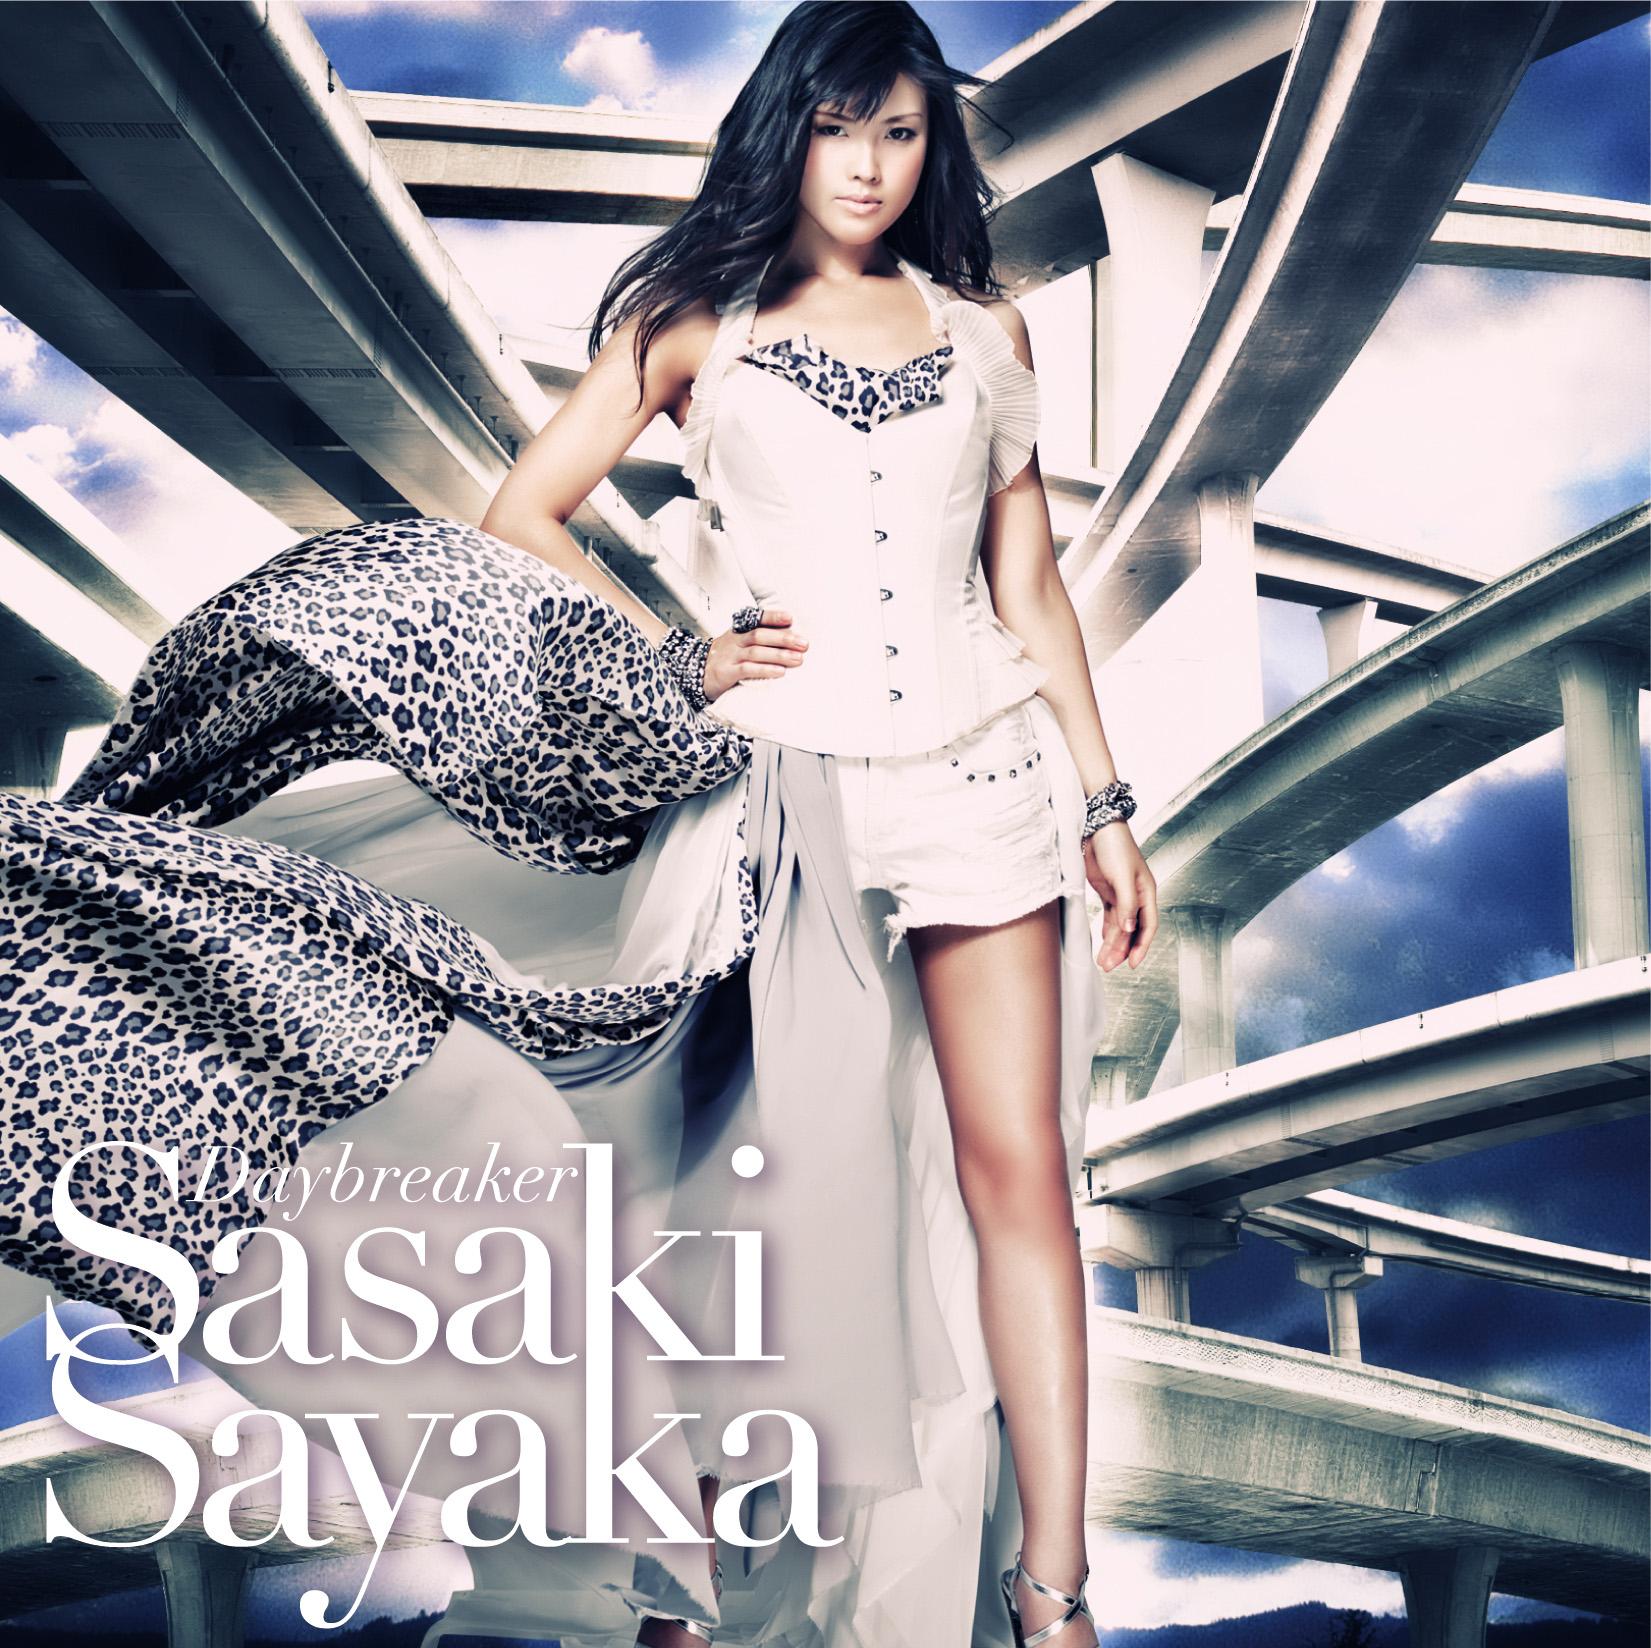 20160908.11.08 Sayaka Sasaki - Daybreaker cover 2.jpg